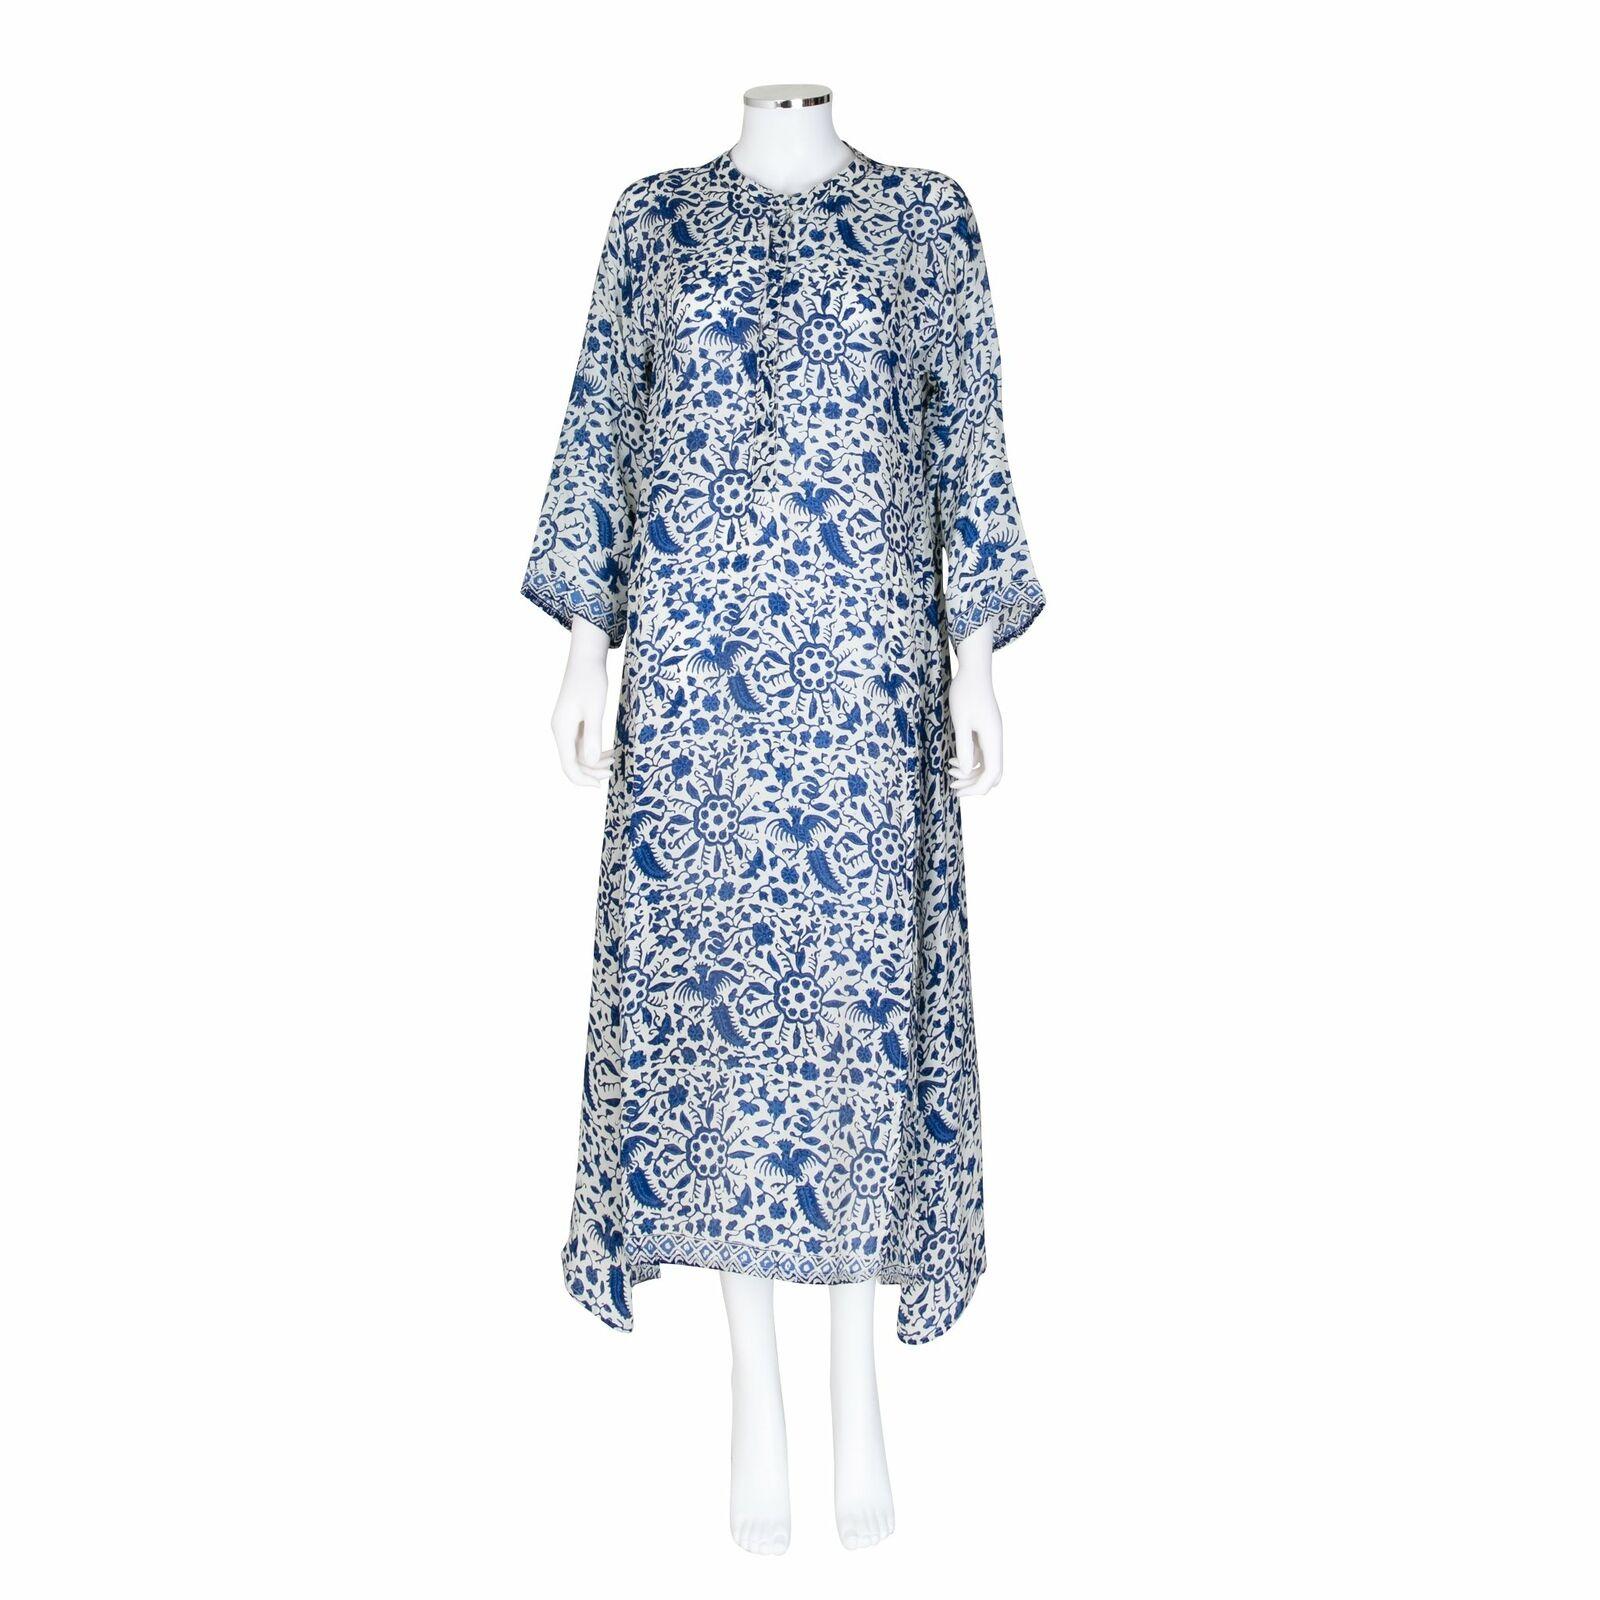 Natalie Martin Floral and Bird Bird Bird Print Midi Dress or Beach Cover-Up - Size M c5855f